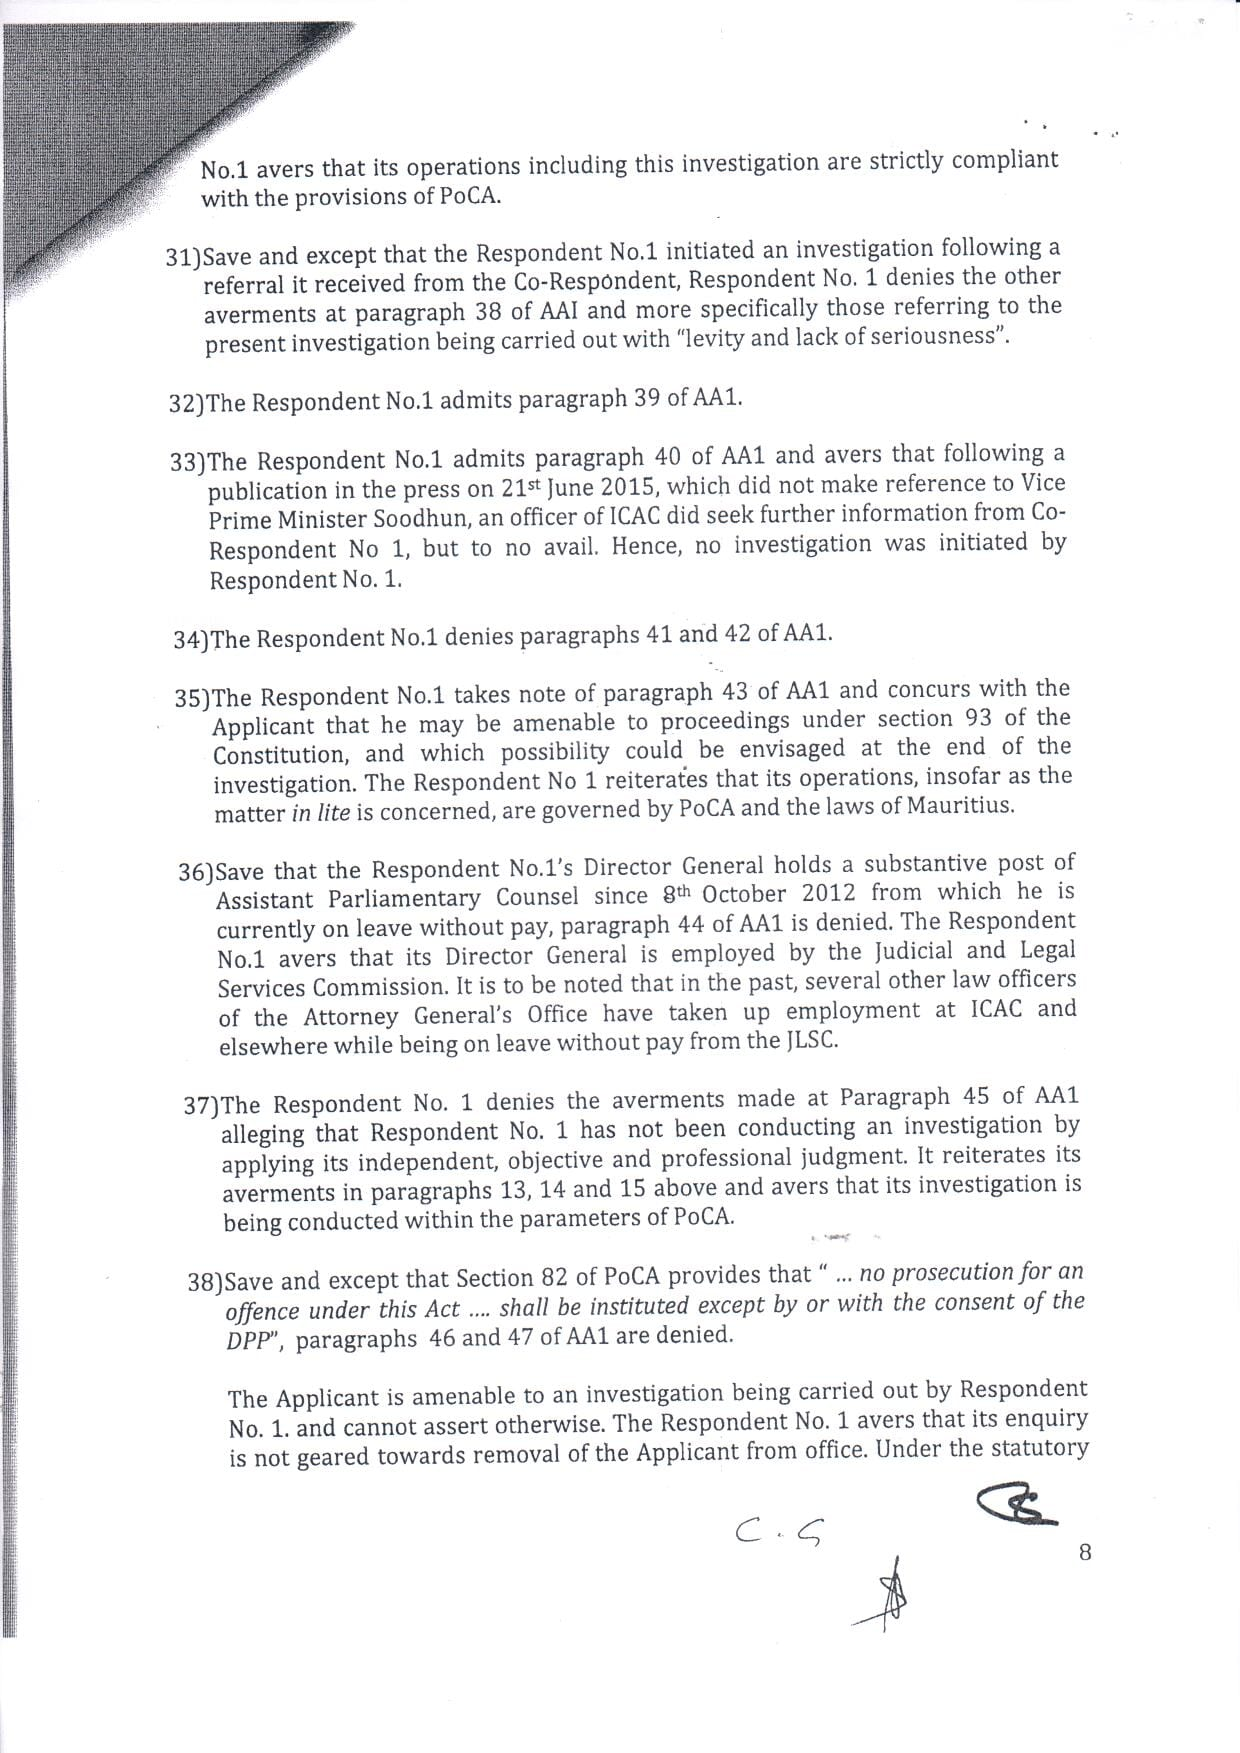 affidavit ICAC boolell 08